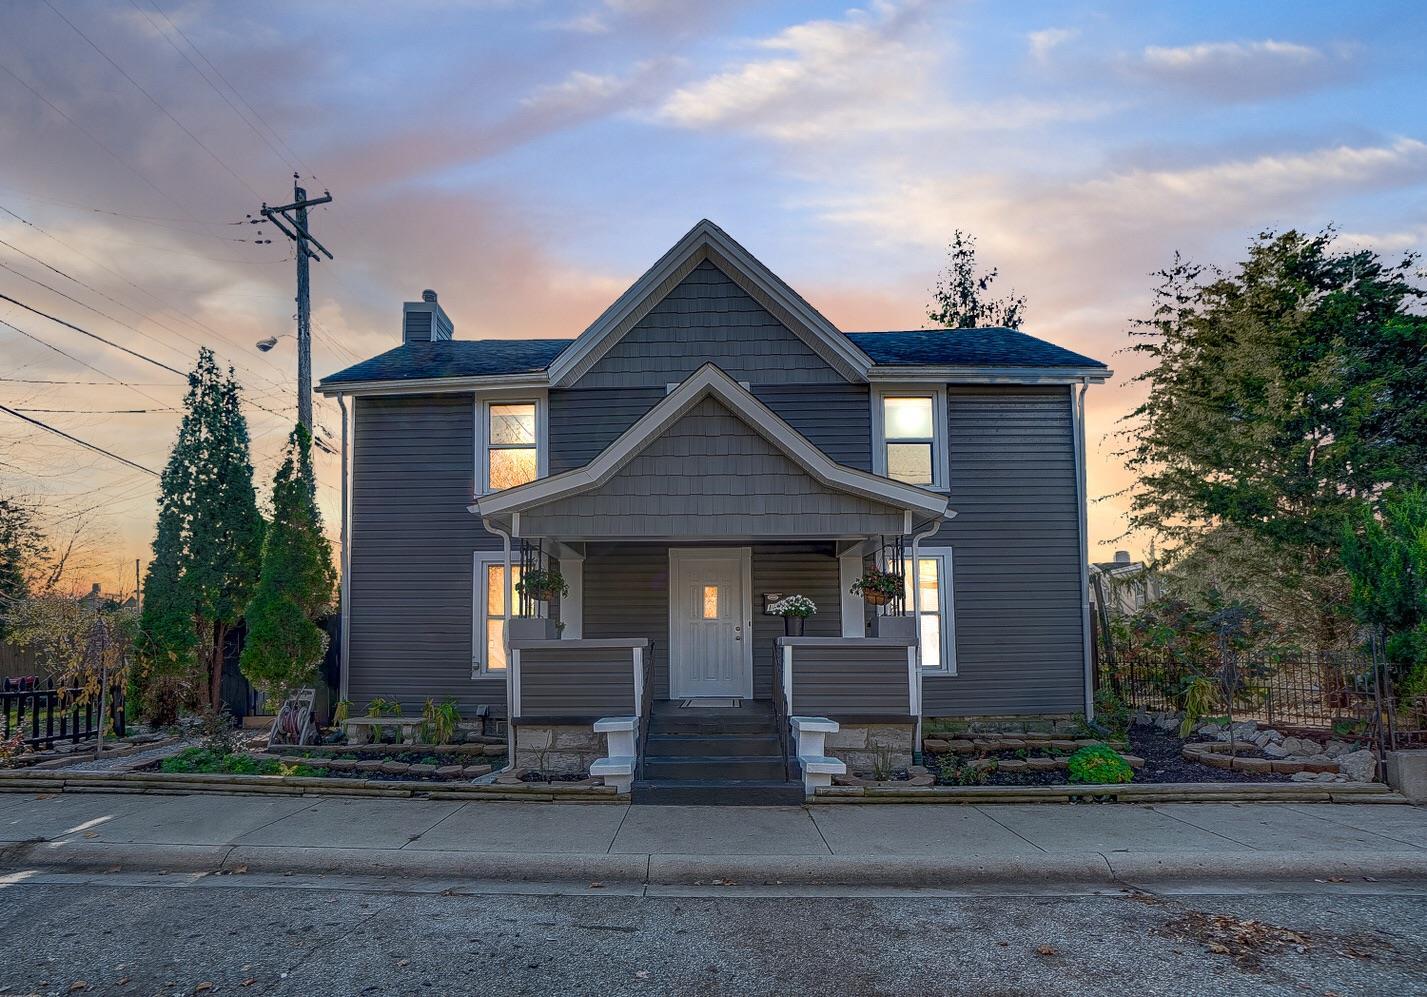 Property for sale at 11 E Pleasant Street, Lebanon,  Ohio 45036